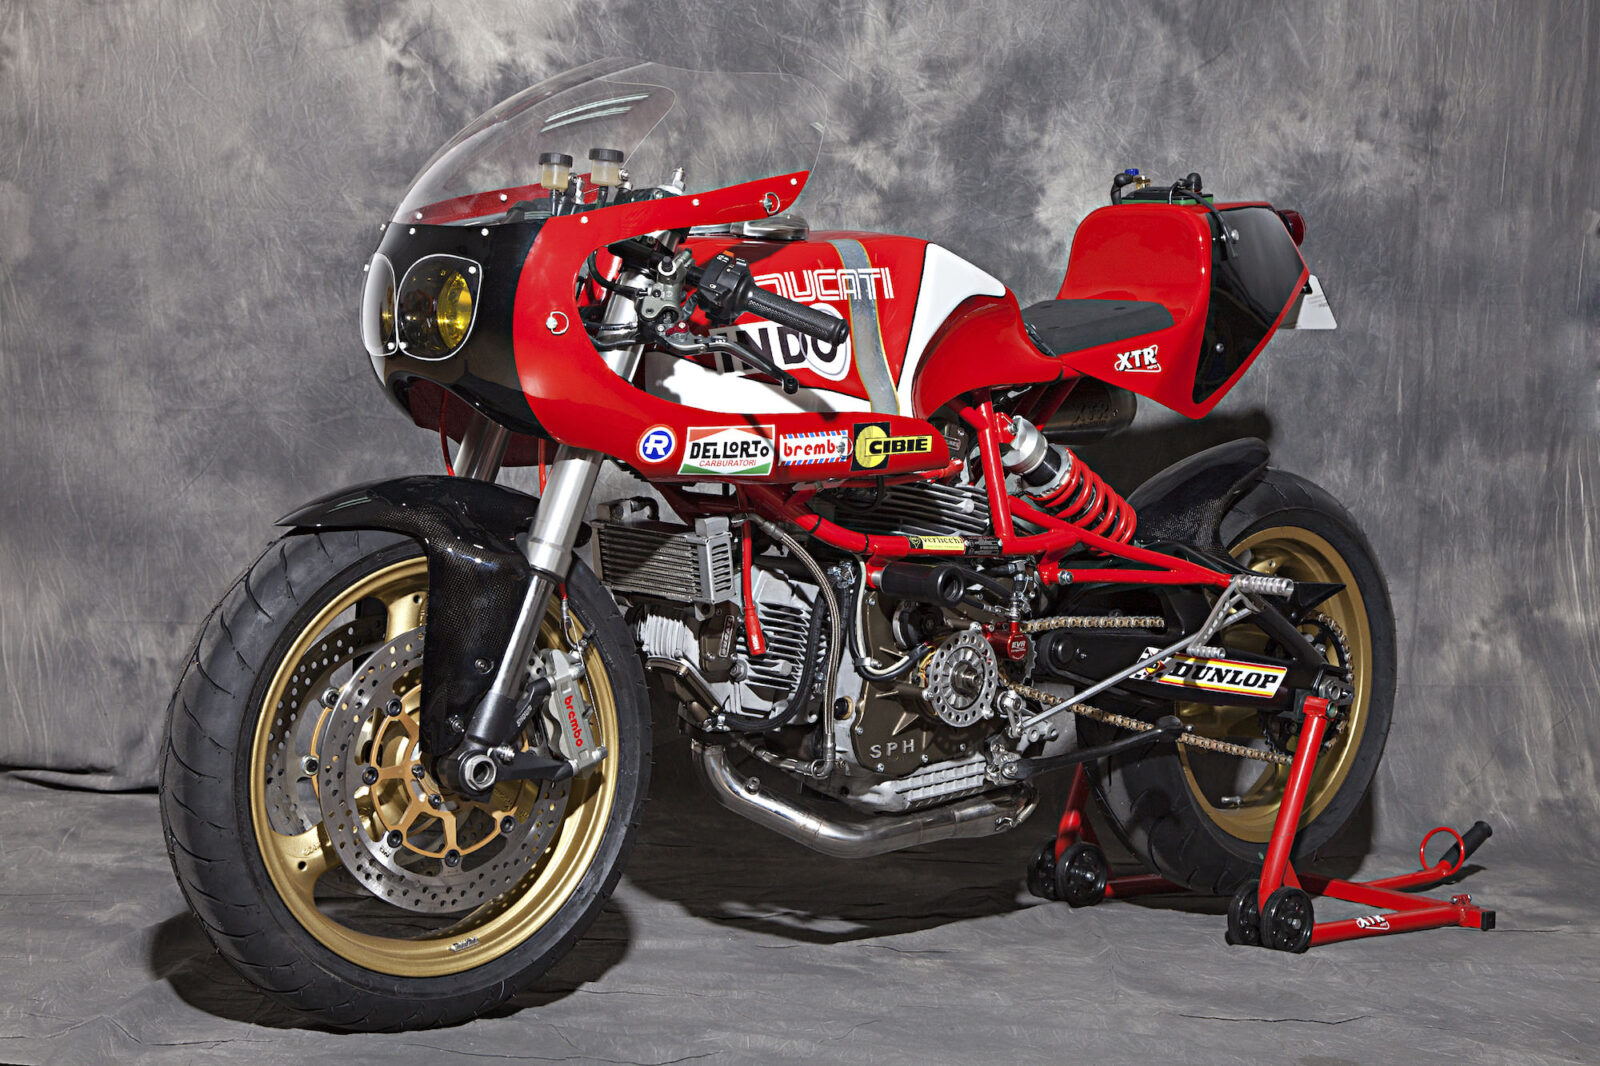 Ducati Custom Motorcycle 16 1600x1066 - Ducati Bol d'Or by XTR Pepo